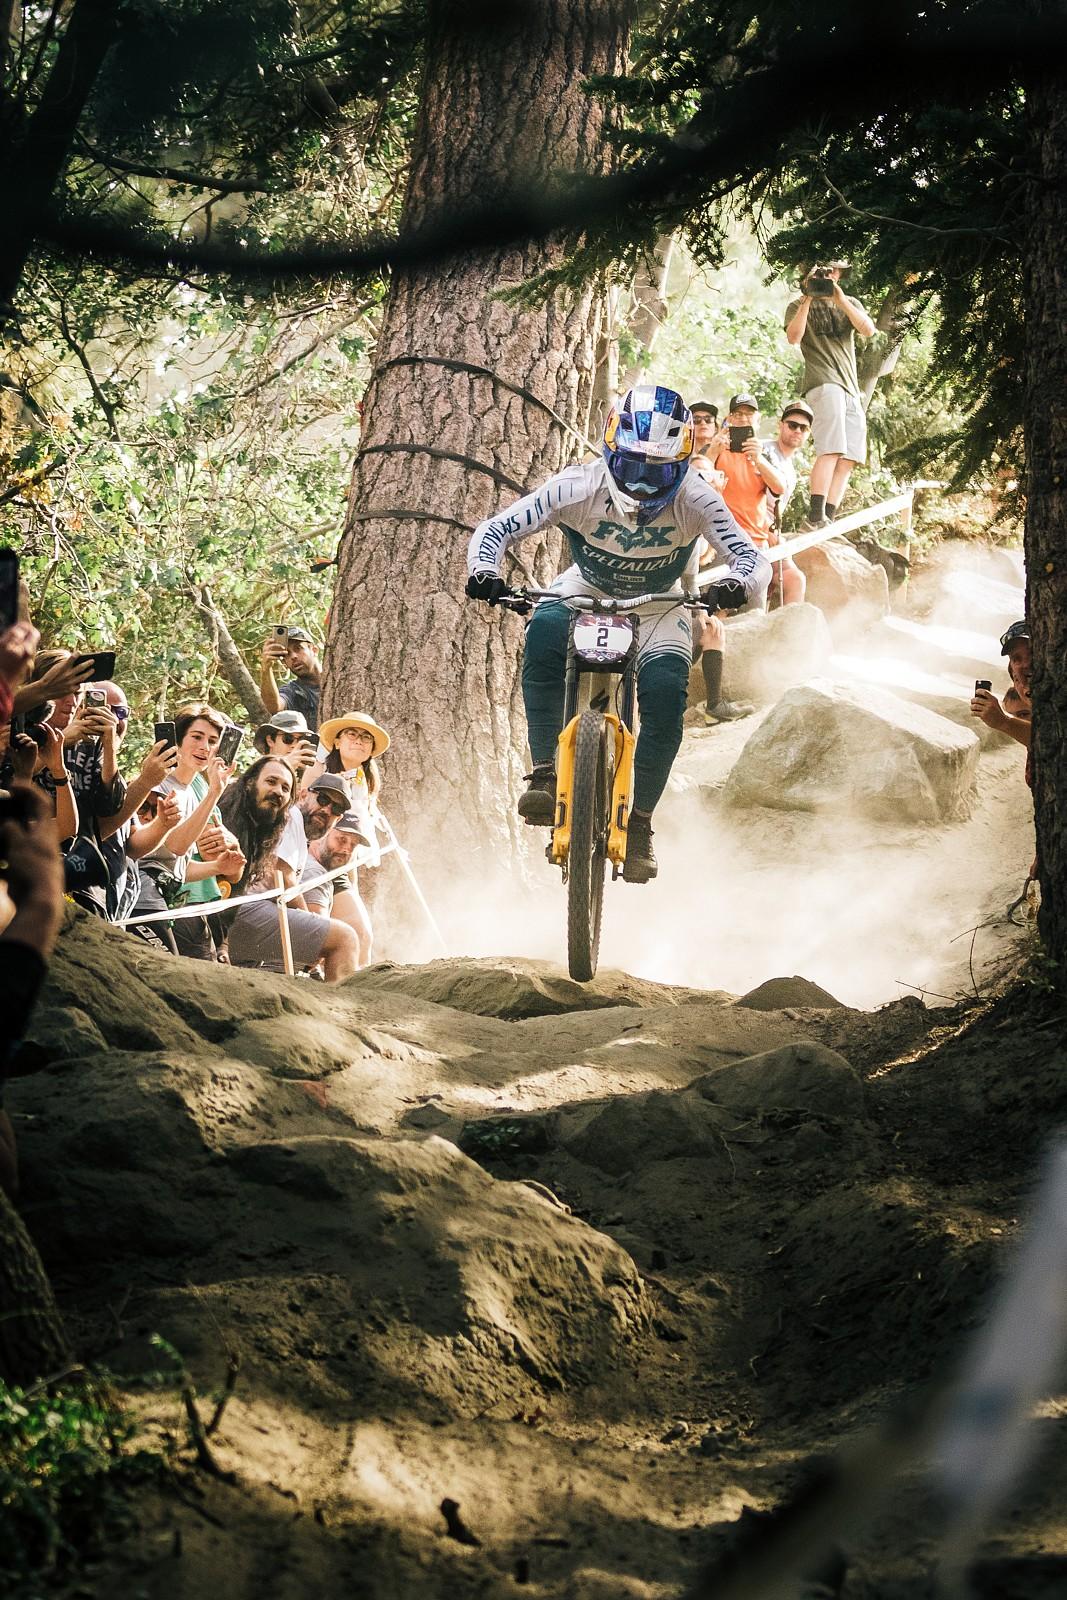 2019USOpenMTB DH yellow-33 - ALeedomPhotography - Mountain Biking Pictures - Vital MTB